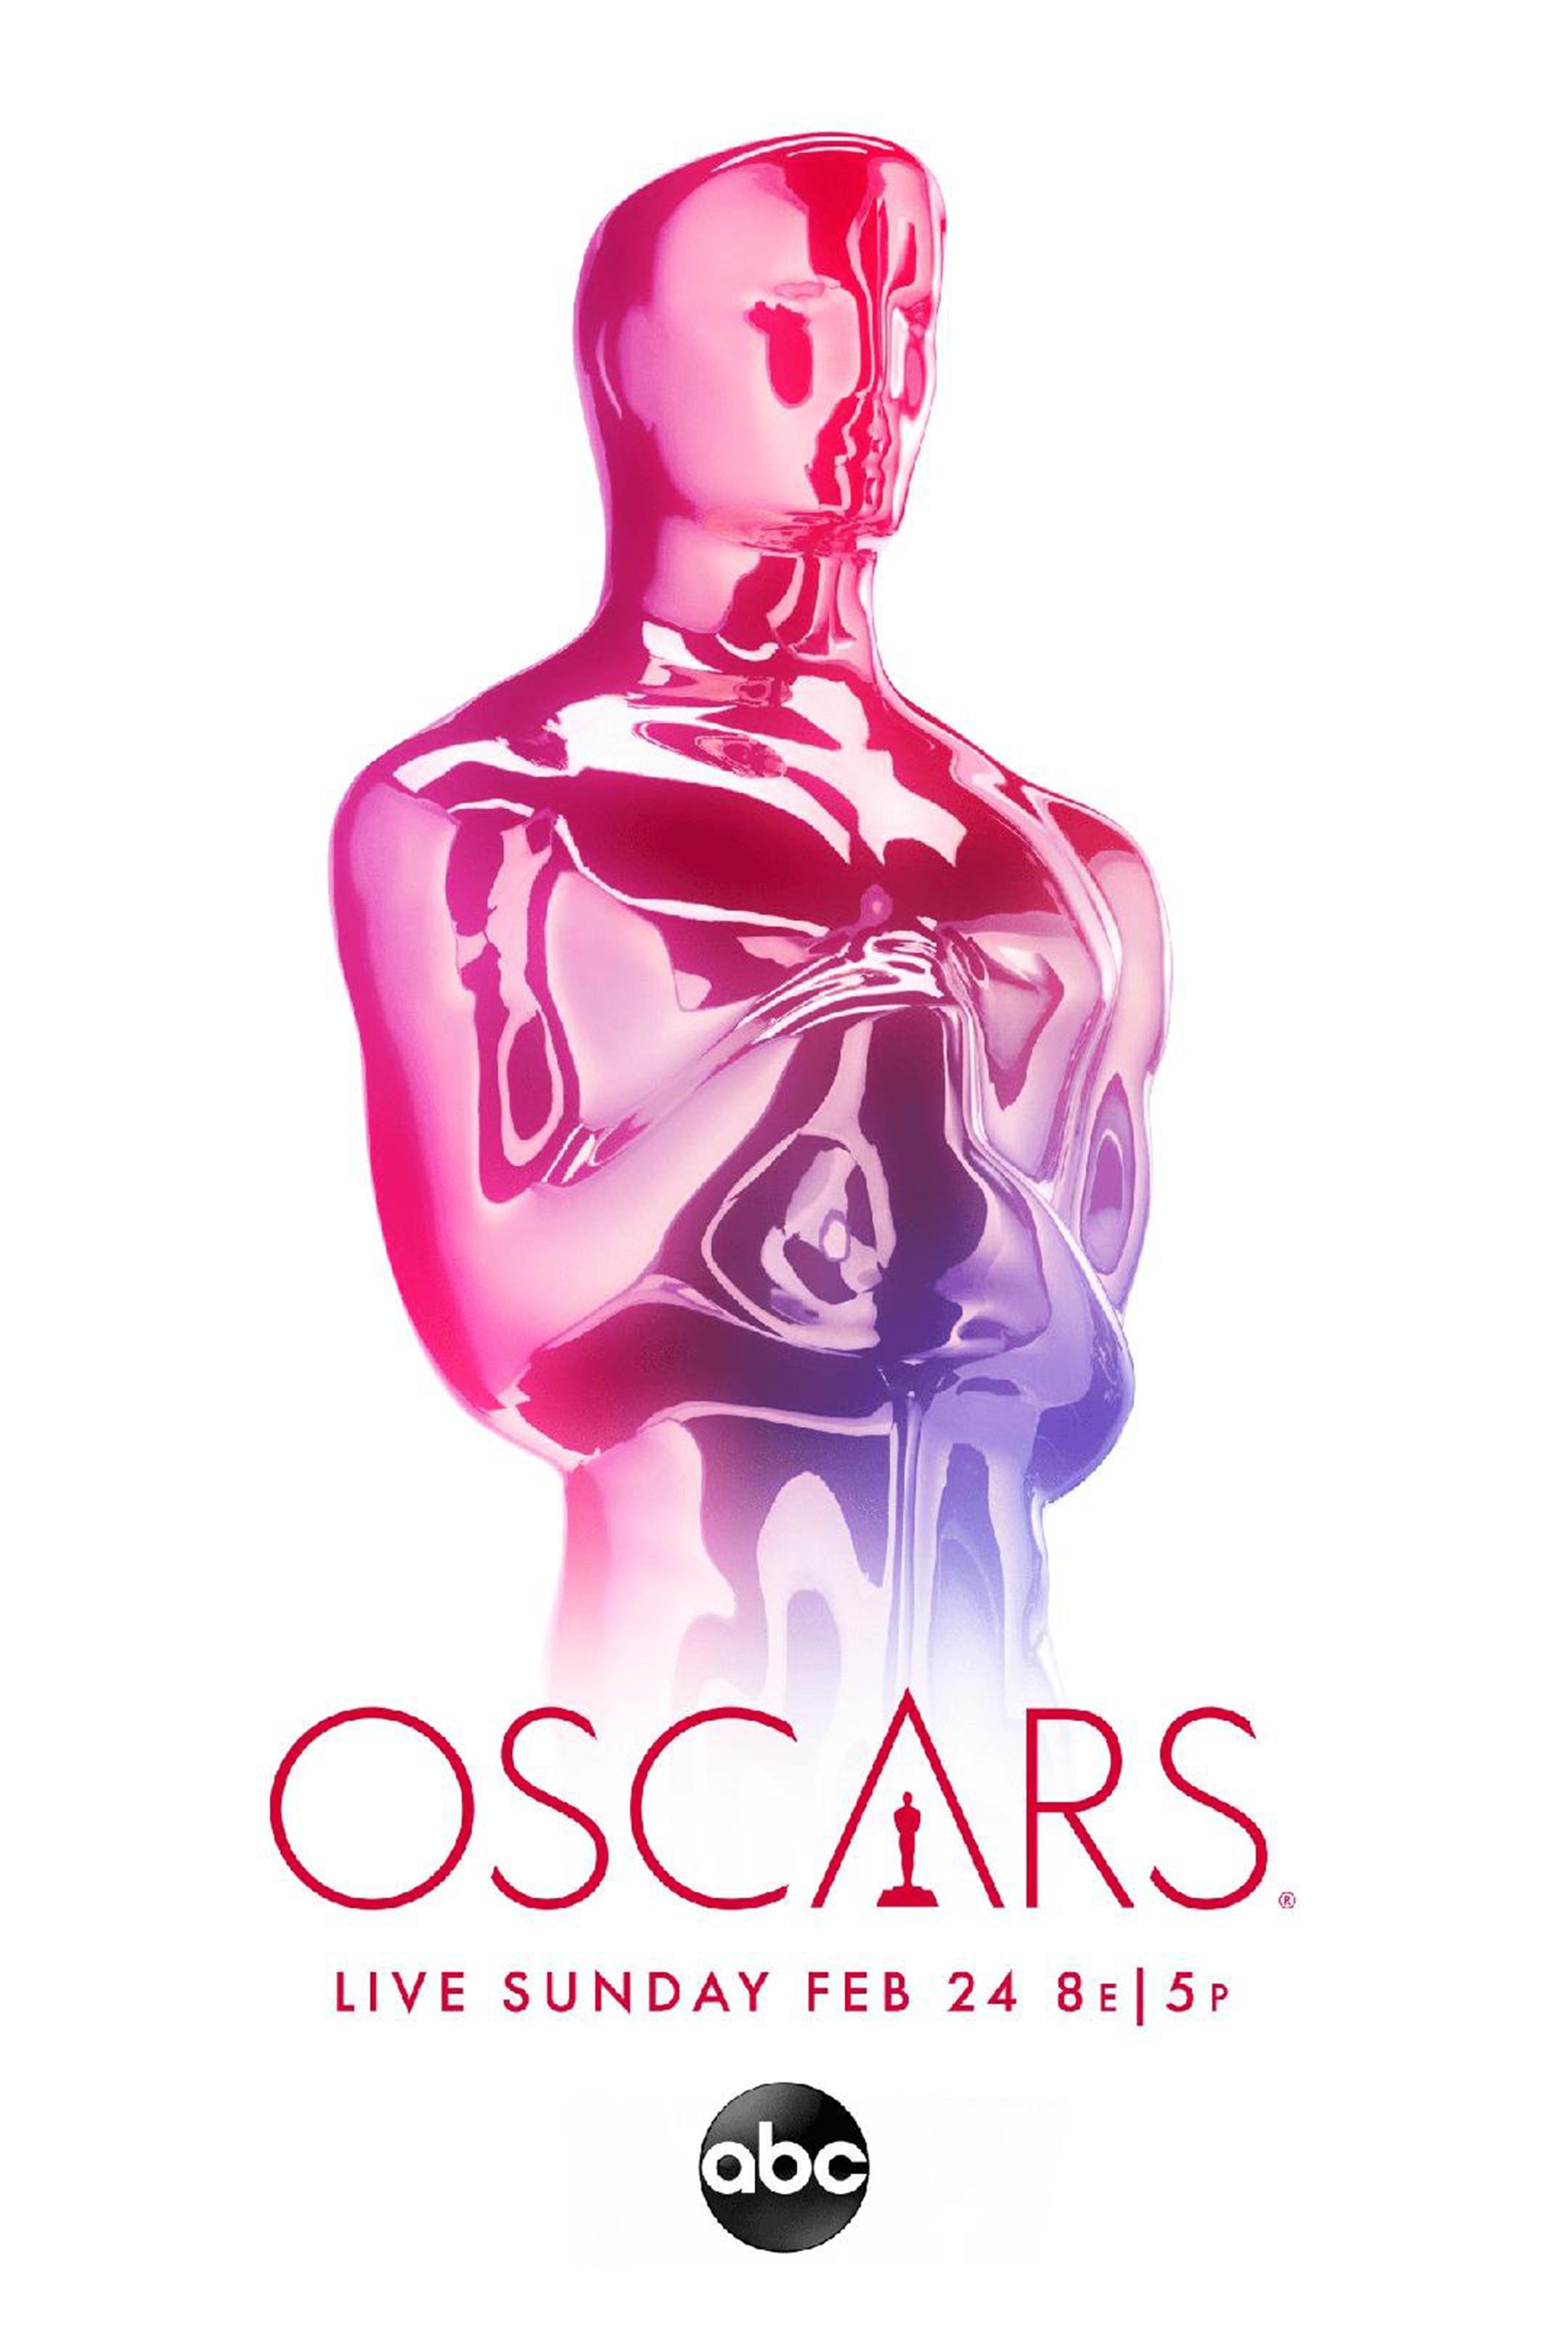 دانلود زیرنویس فارسی فیلم The Oscars